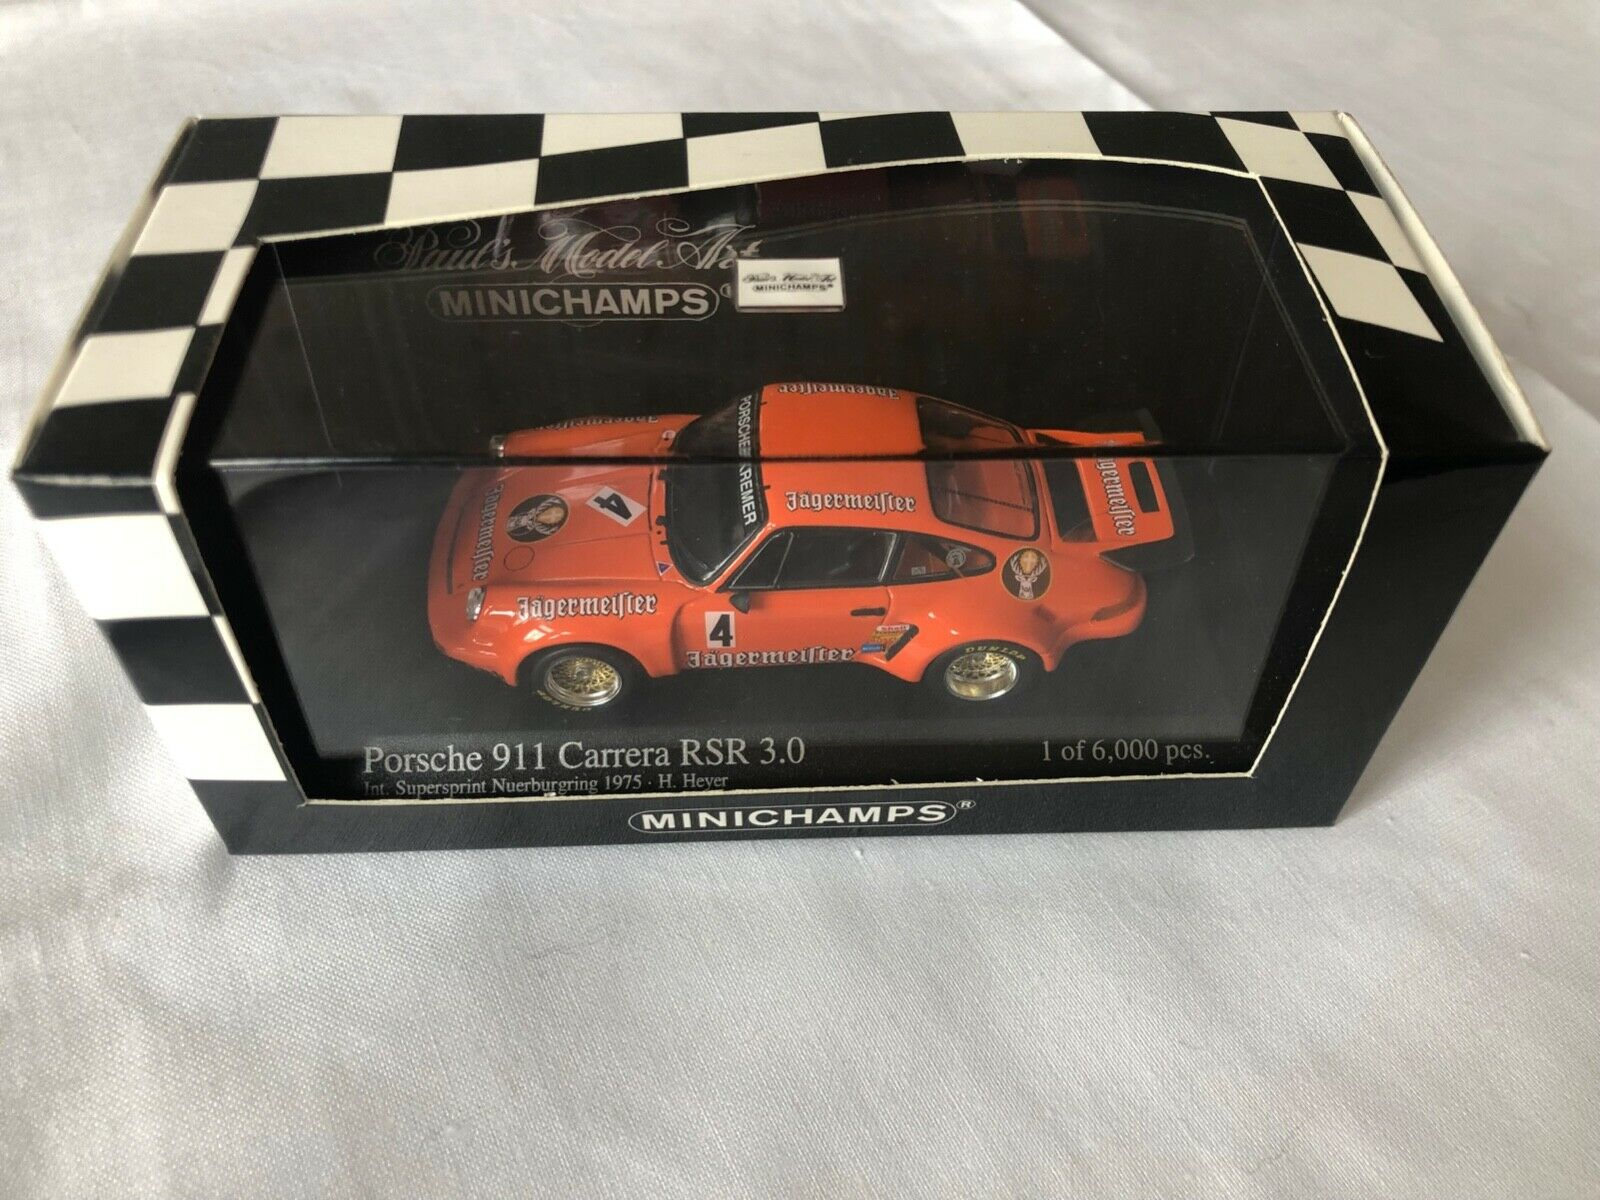 Porsche 911 Carrera RSR 3.0 Supersprint 1975 Heyer 430756904 Minichamps in 1 43